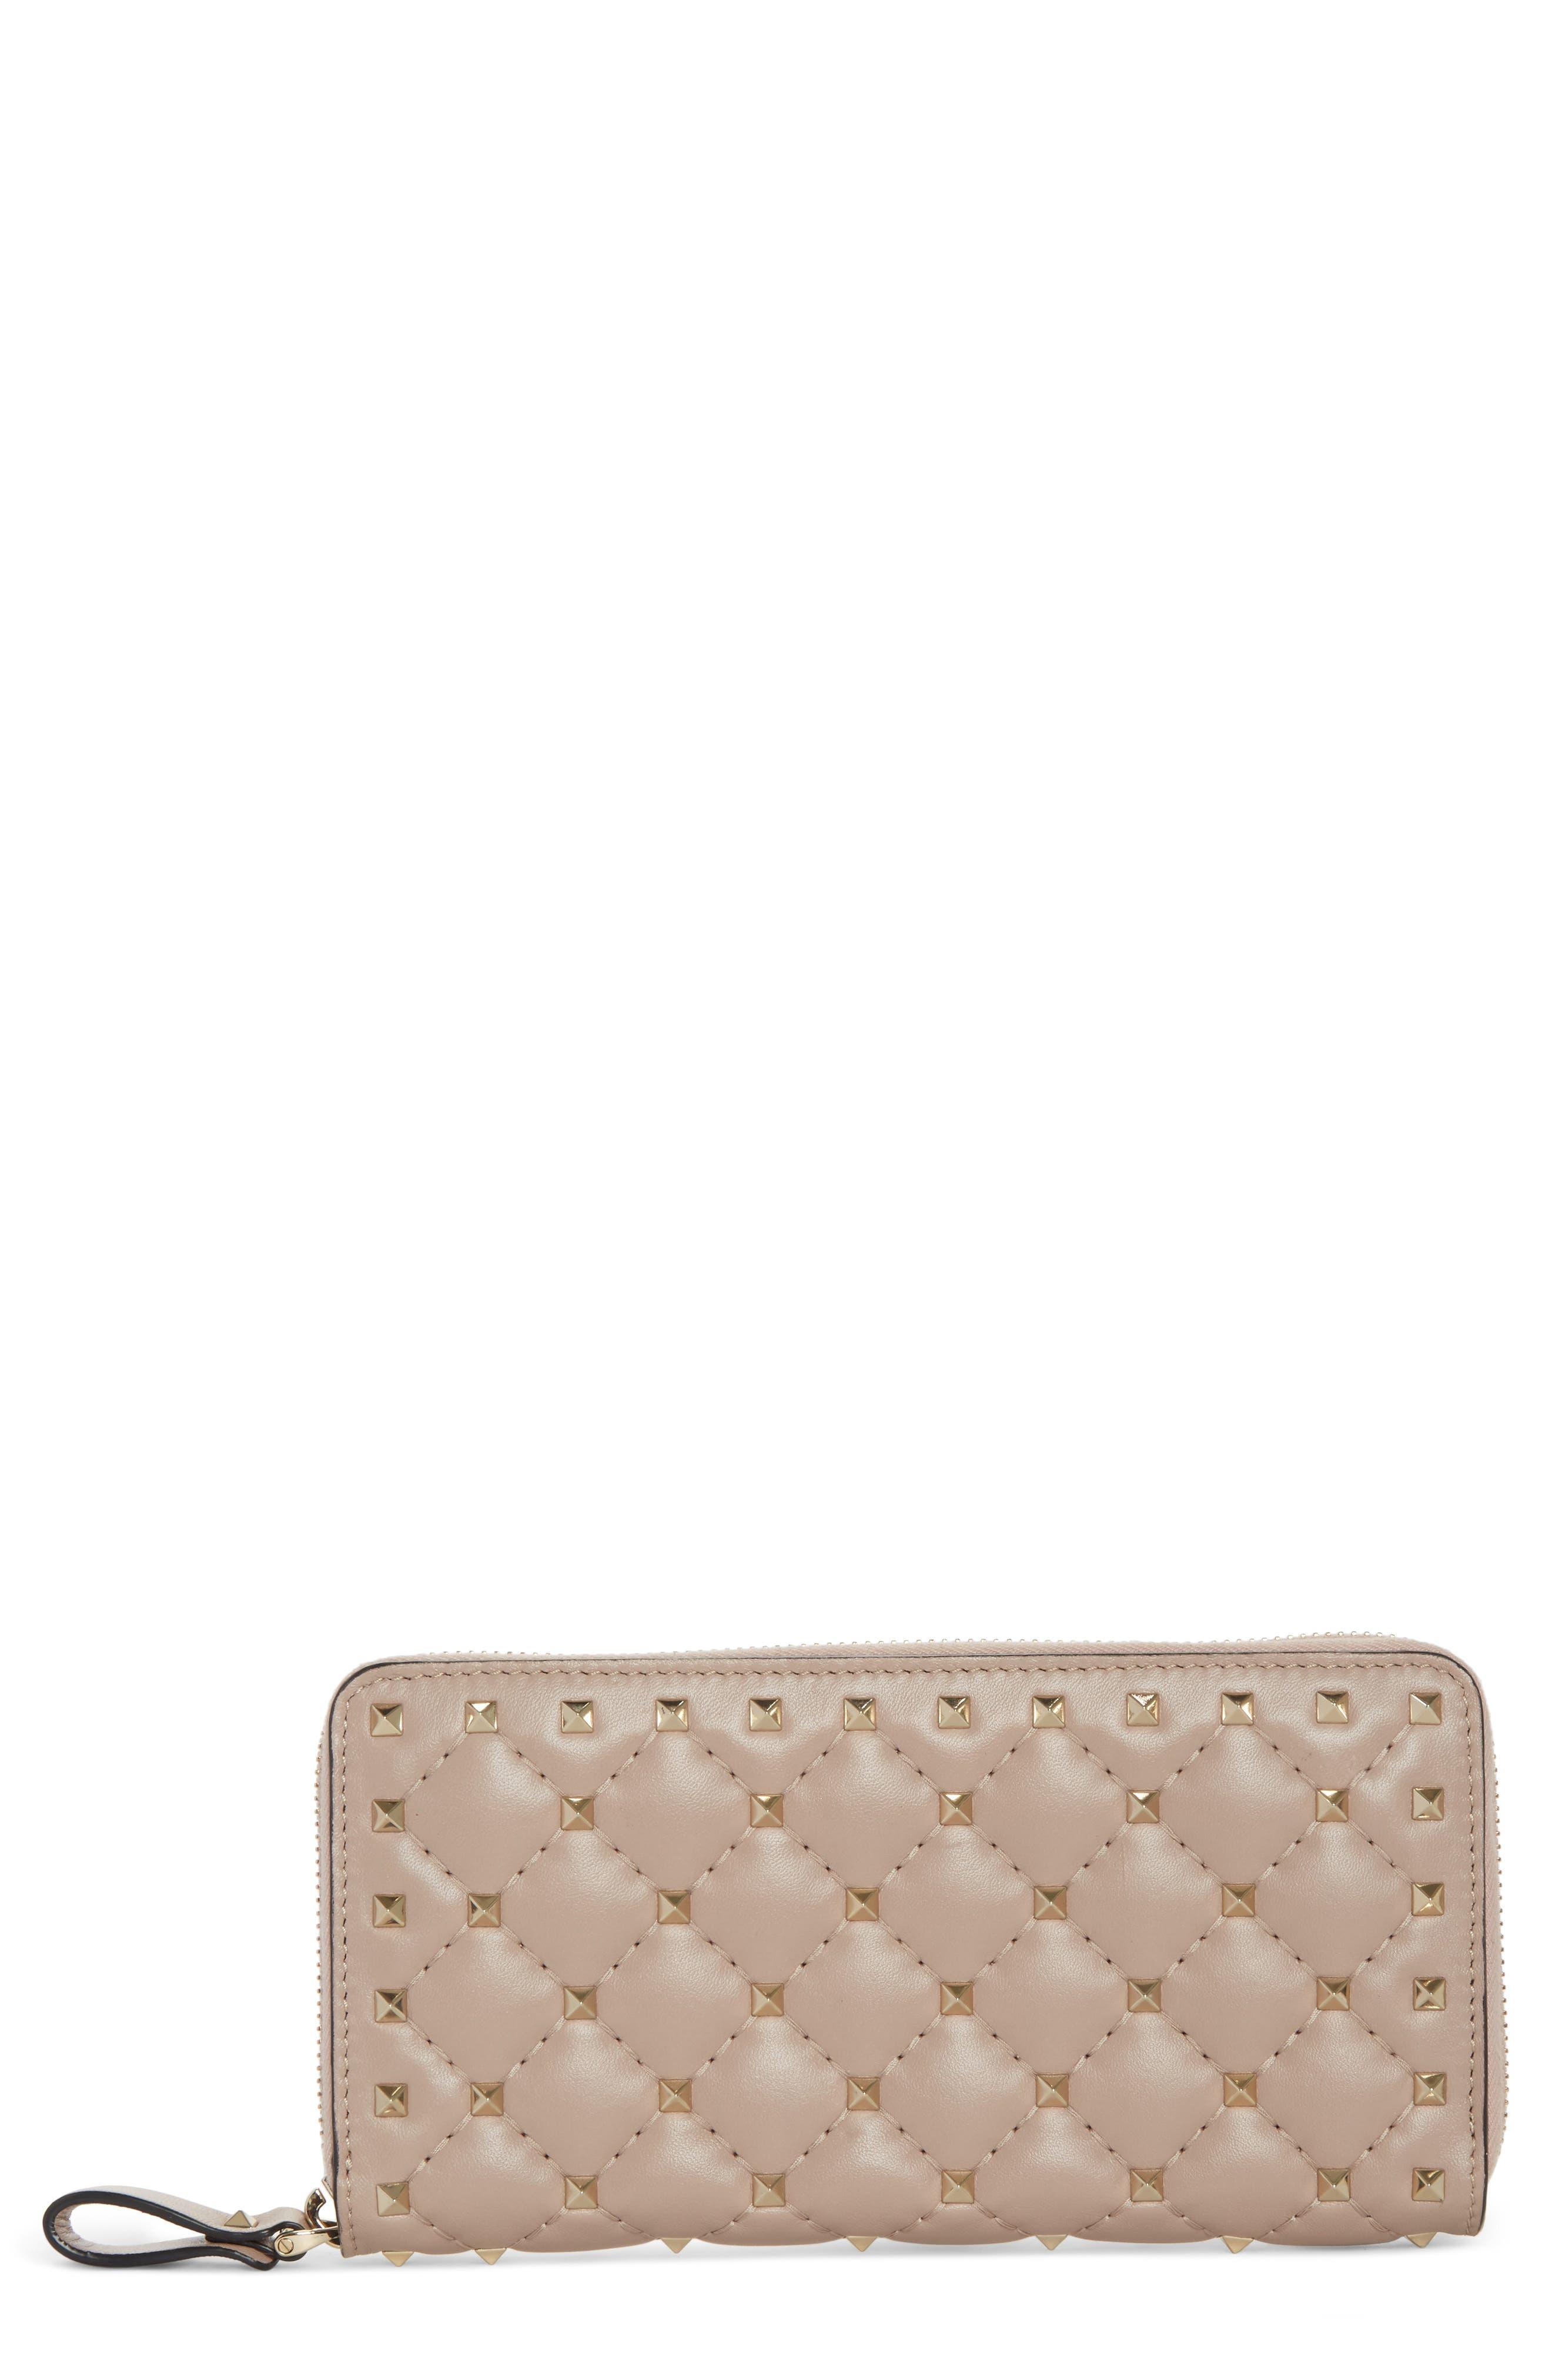 VALENTINO GARAVANI Rockstud Spike Matelassé Leather Continental Wallet, Main, color, POUDRE